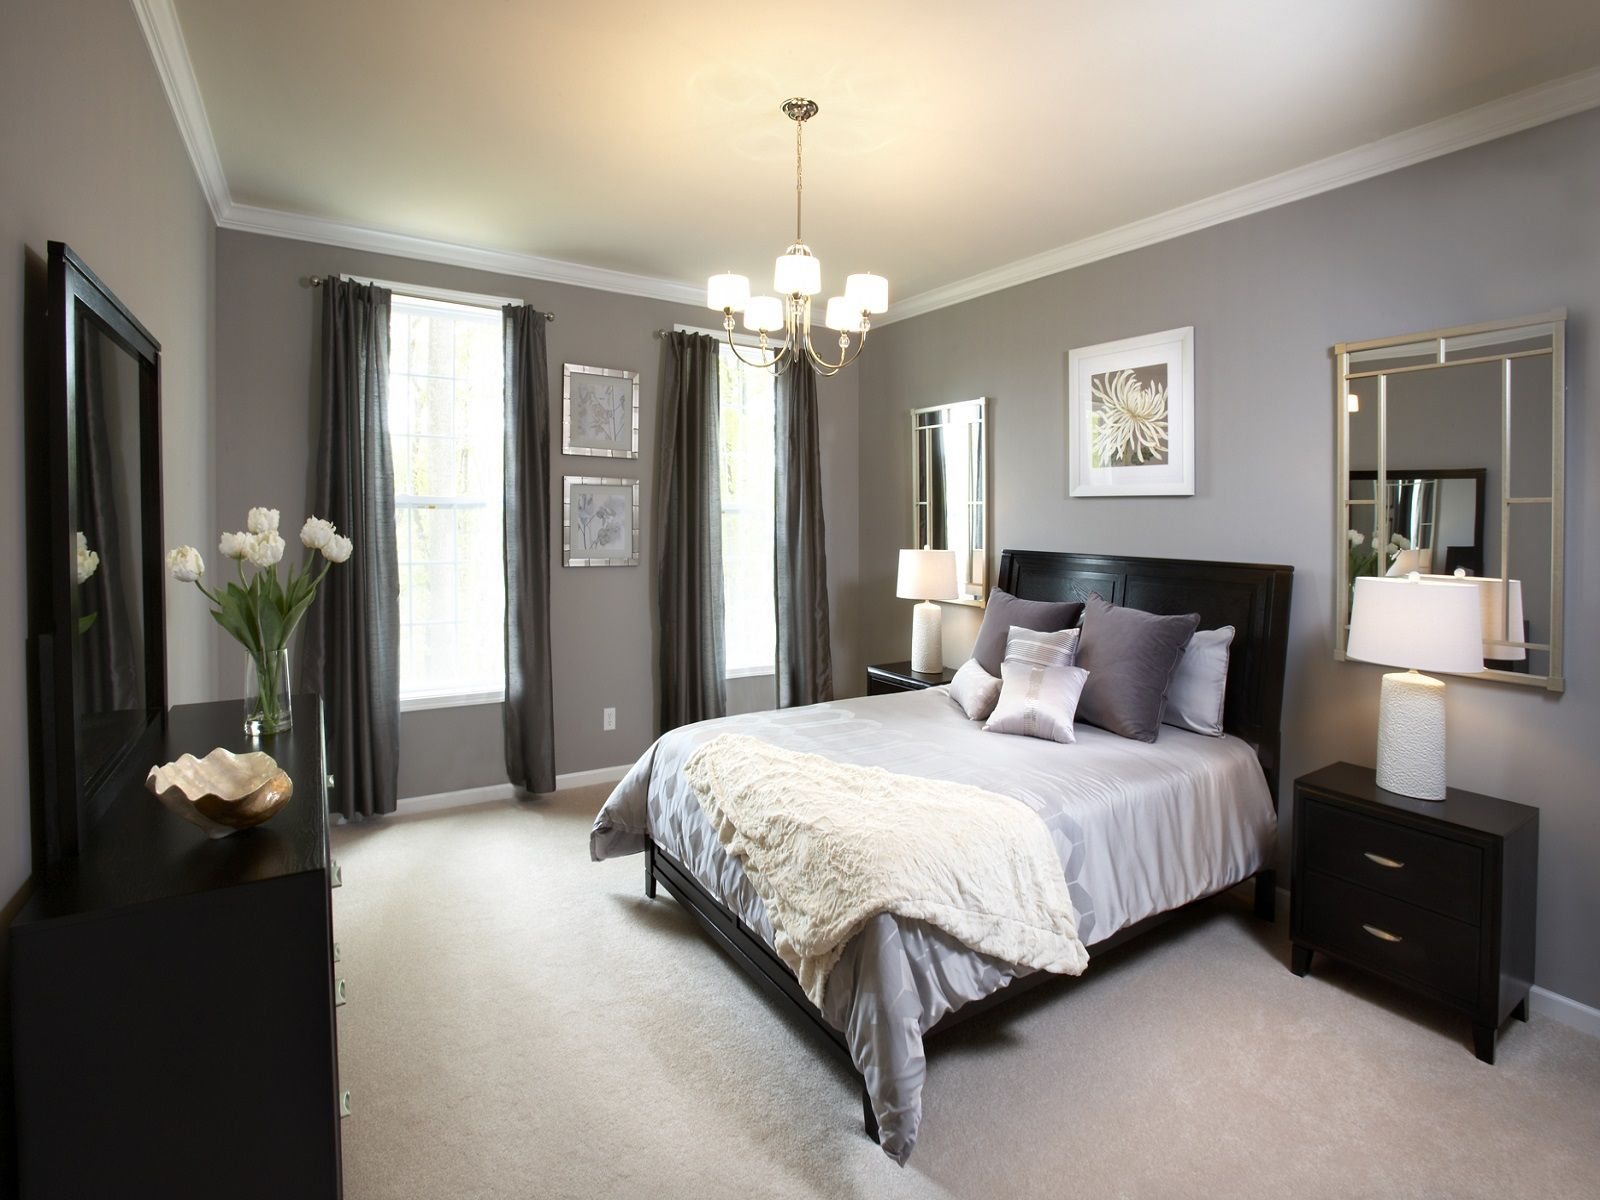 Master Bedroom Paint Colors With Dark Furniture Home Bedroom in measurements 1600 X 1200